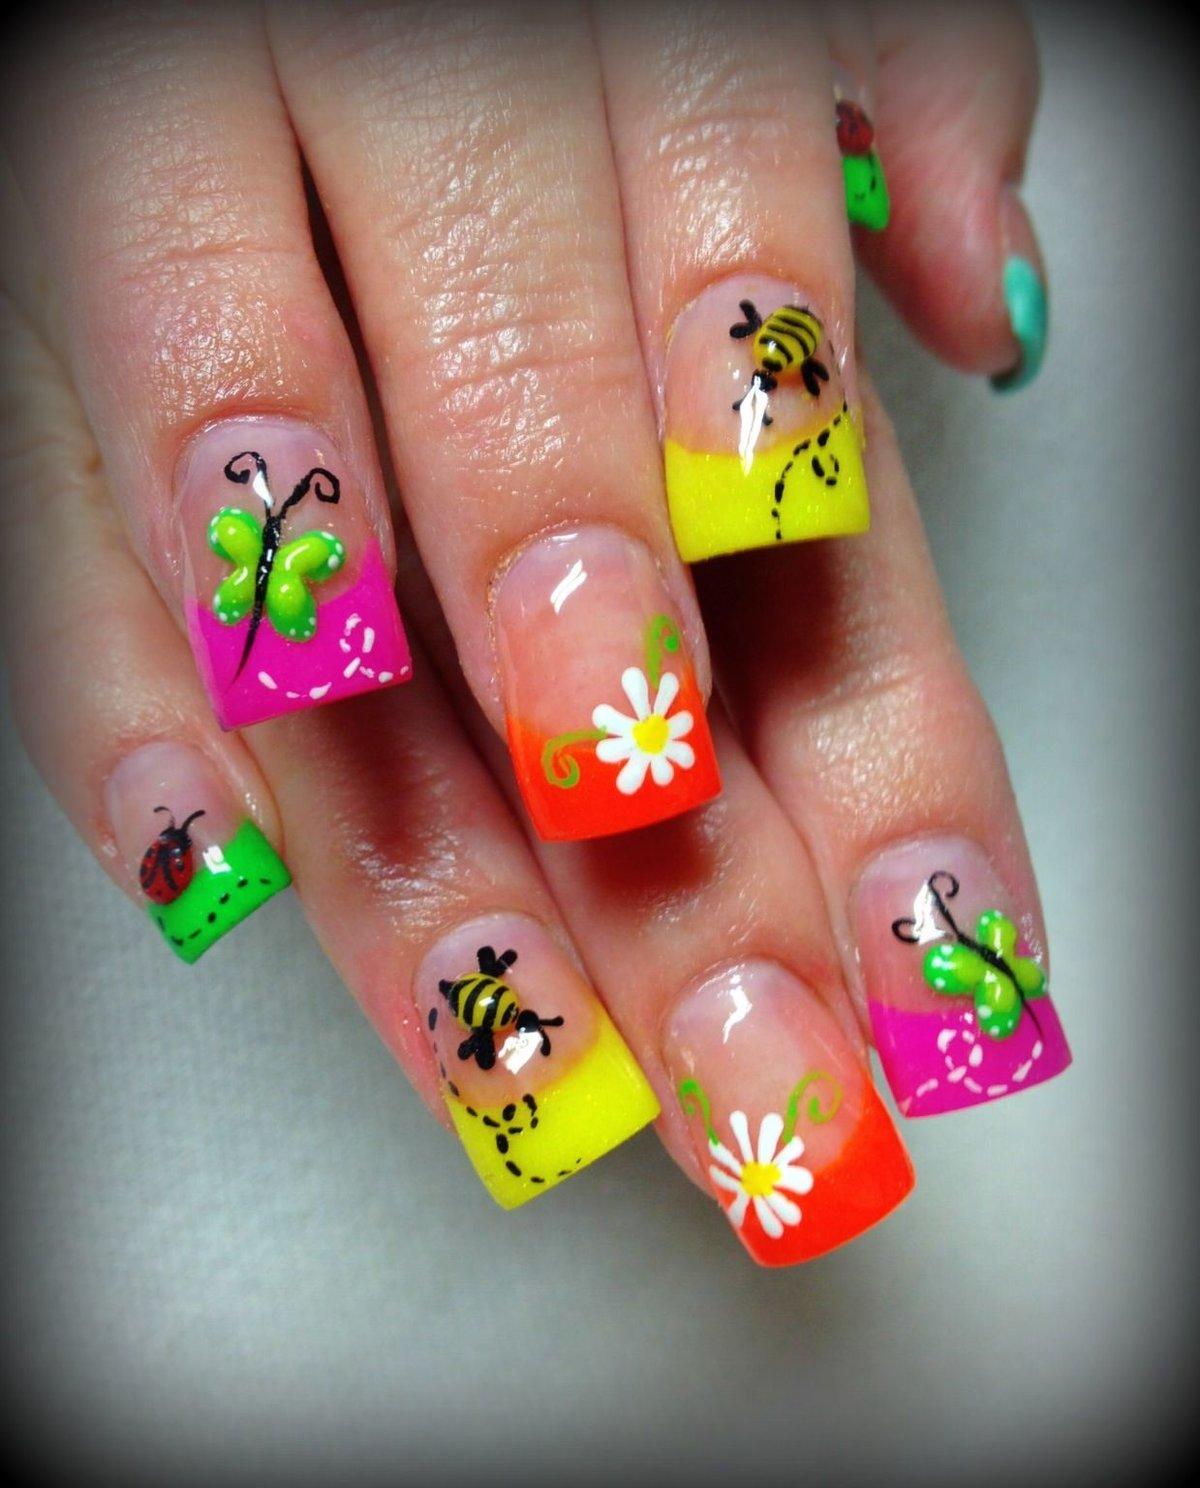 Яркий дизайн ногтей лето 2018 фото